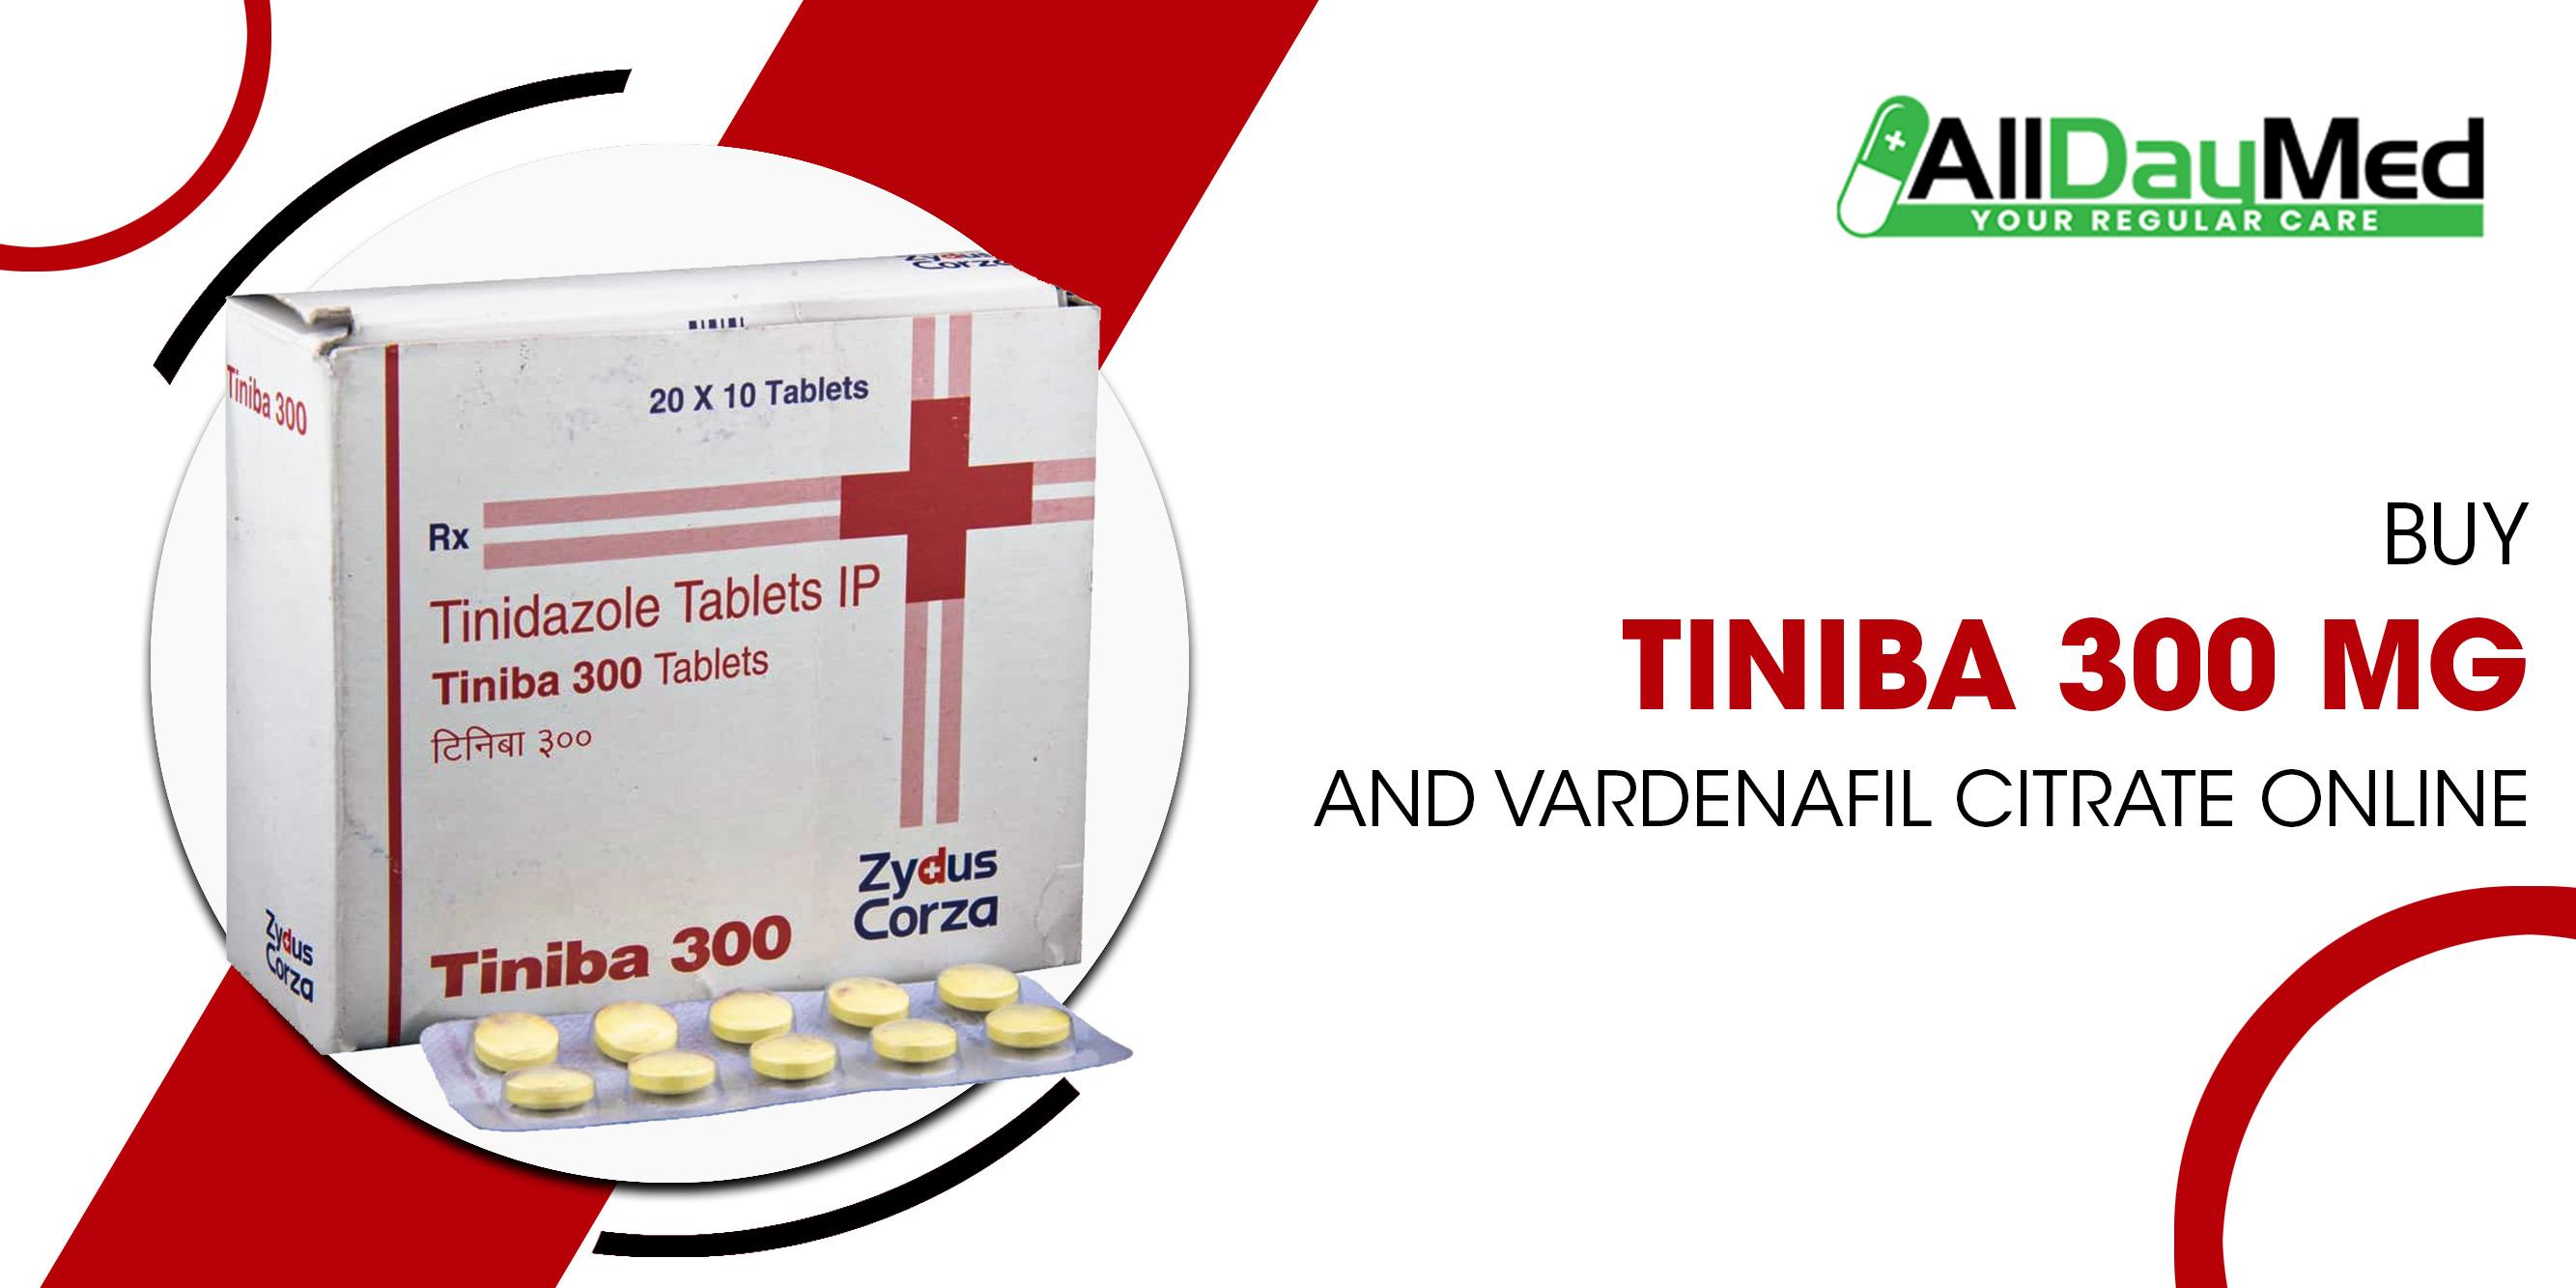 Buy Tiniba 300mg and Vardenafil citrate online